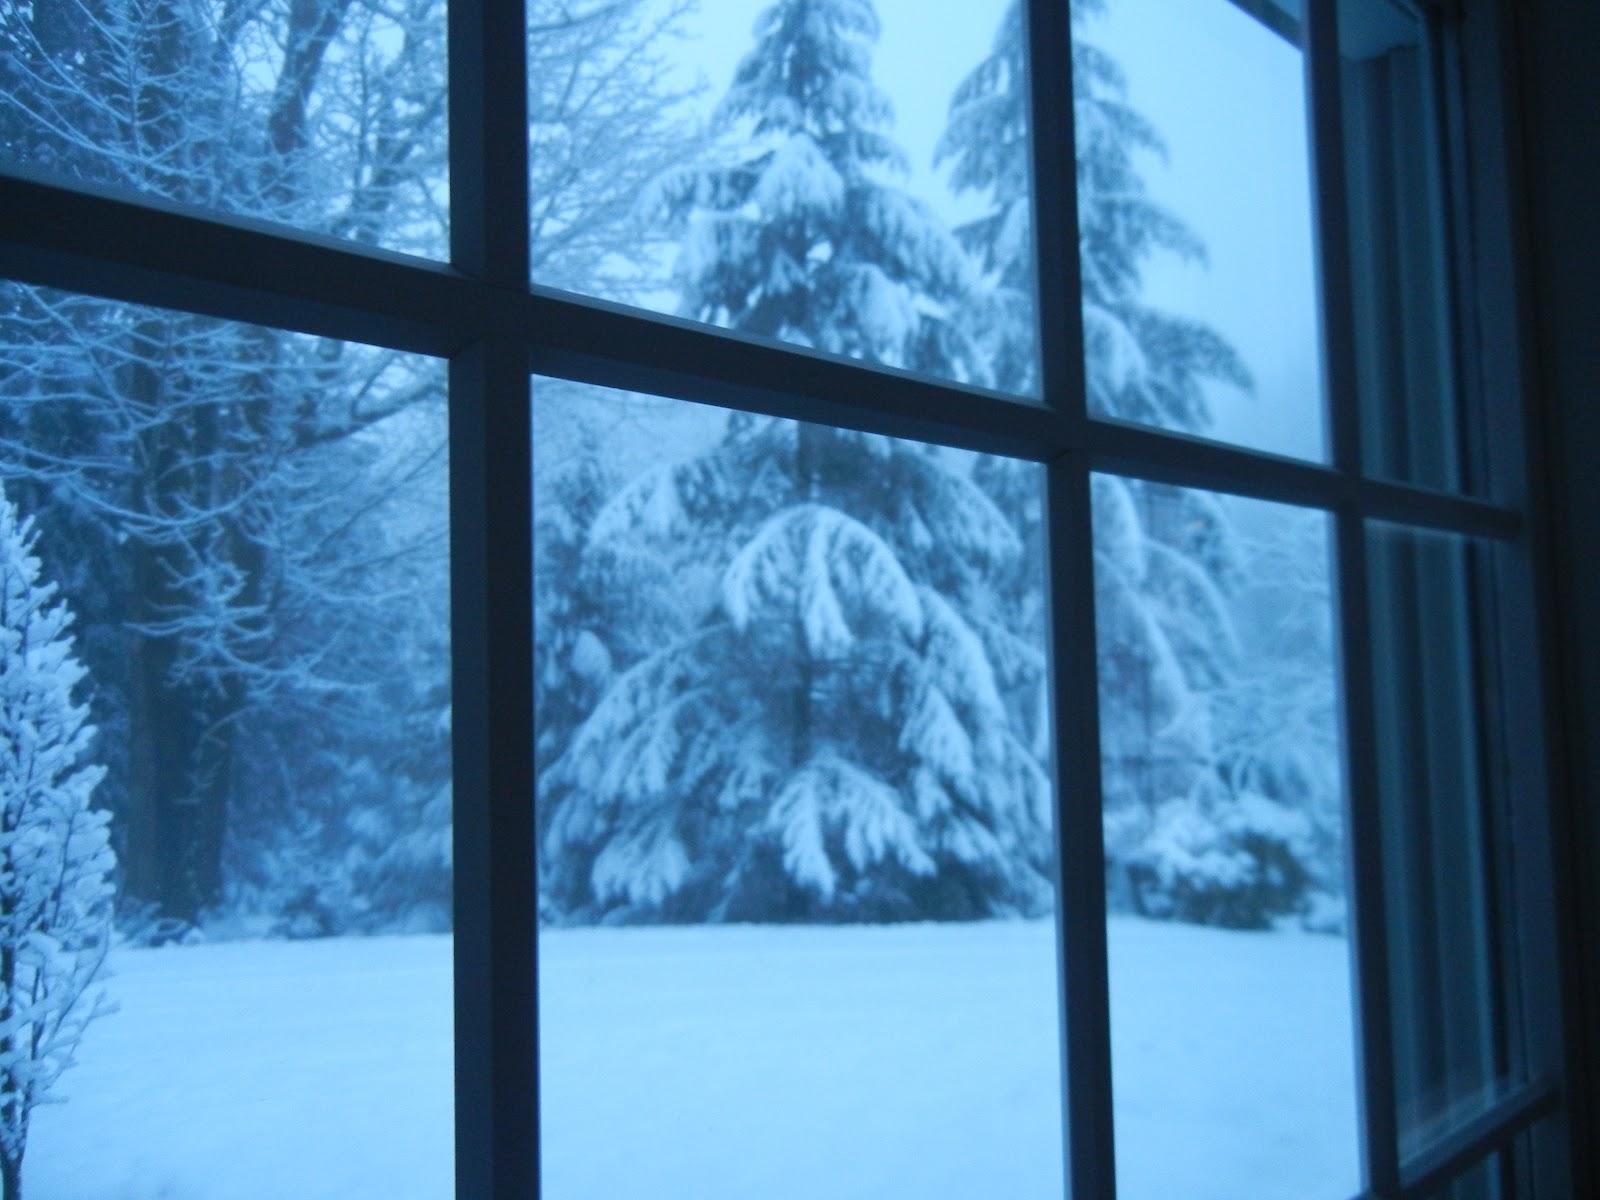 Animated Snow Falling Window | www.imgkid.com - The Image ...